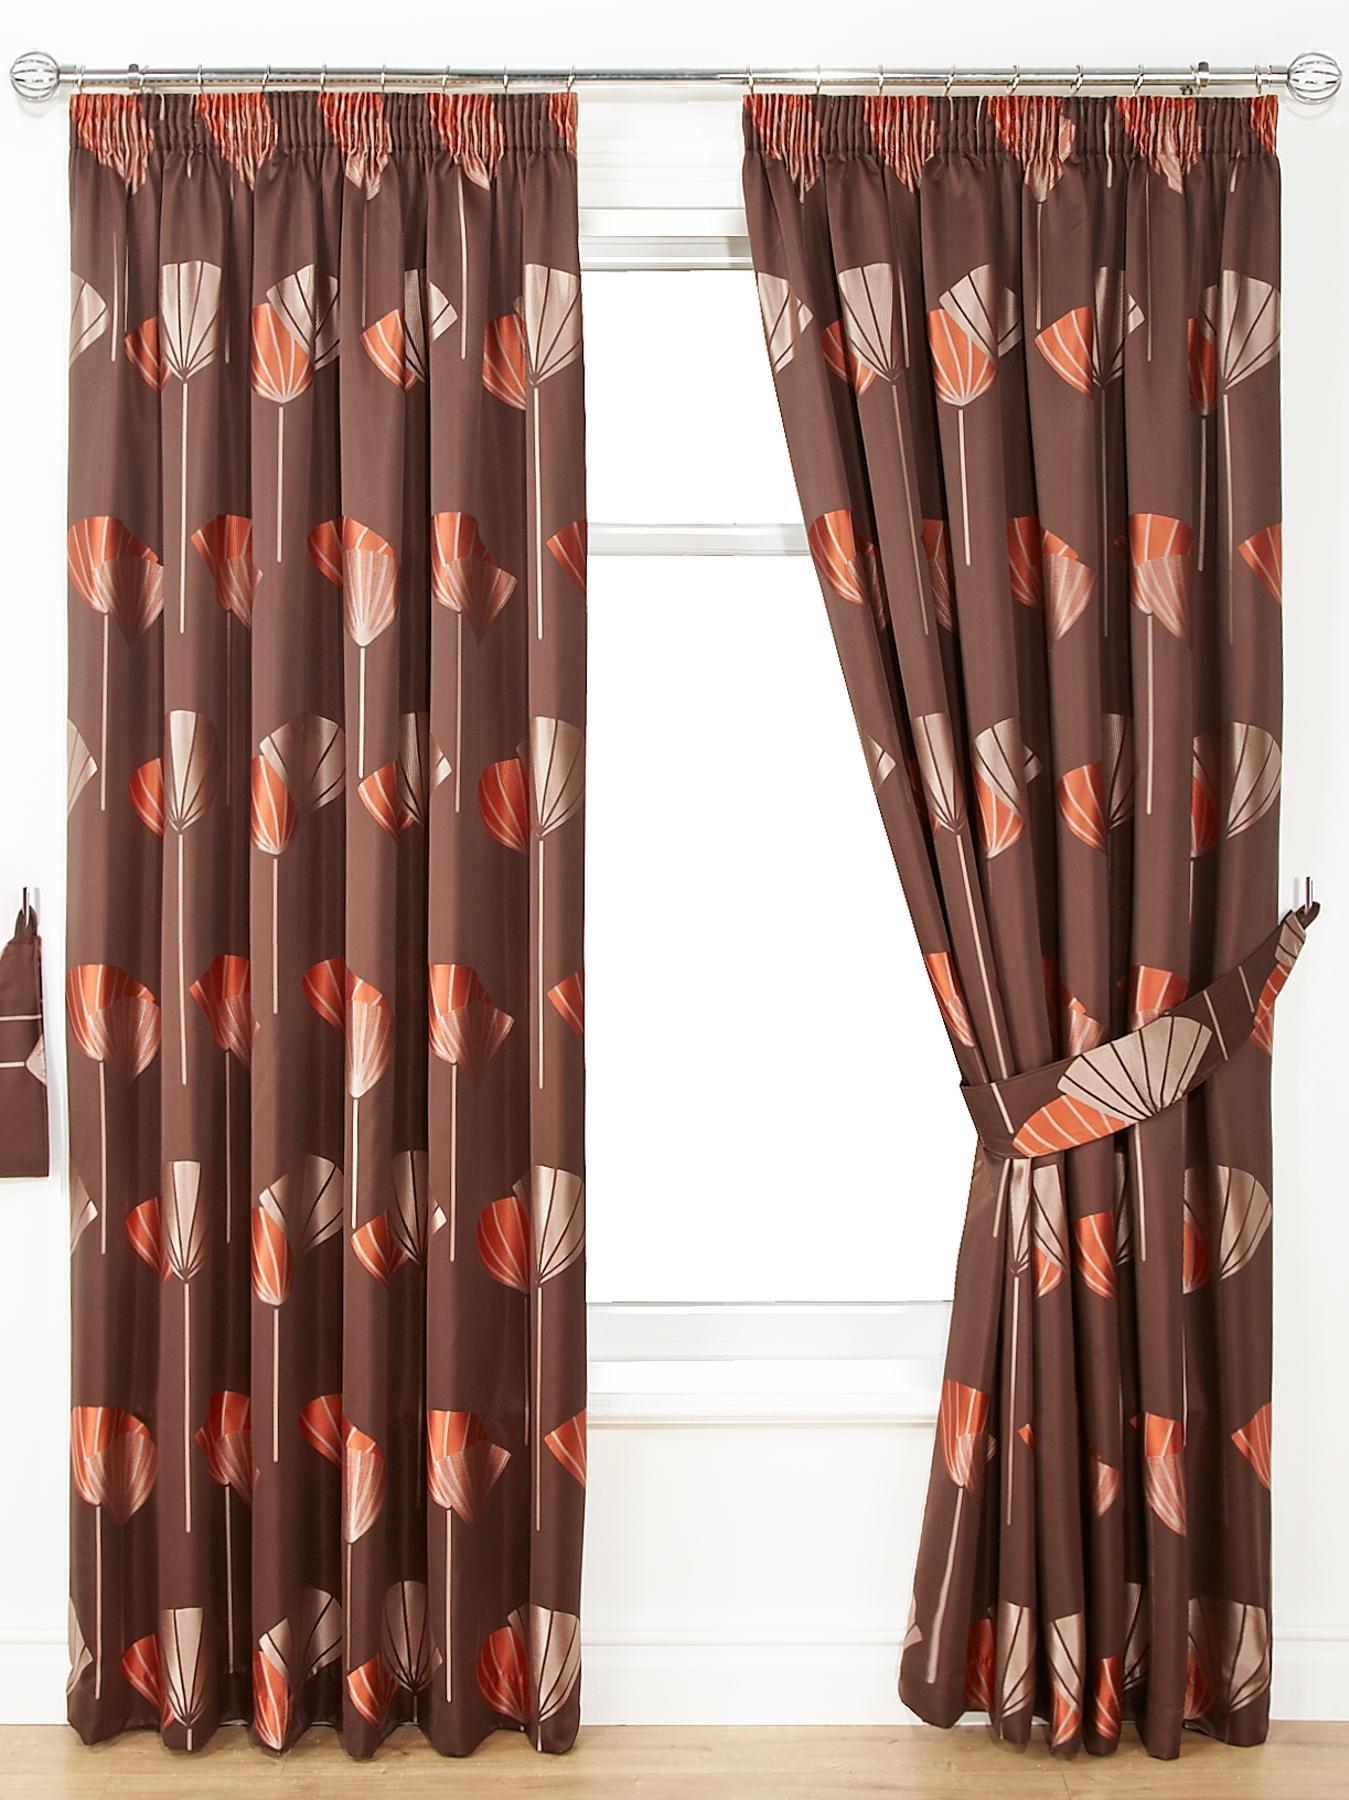 Dandelion Jacquard Pencil Pleat Curtains, Red,Black,Chocolate.